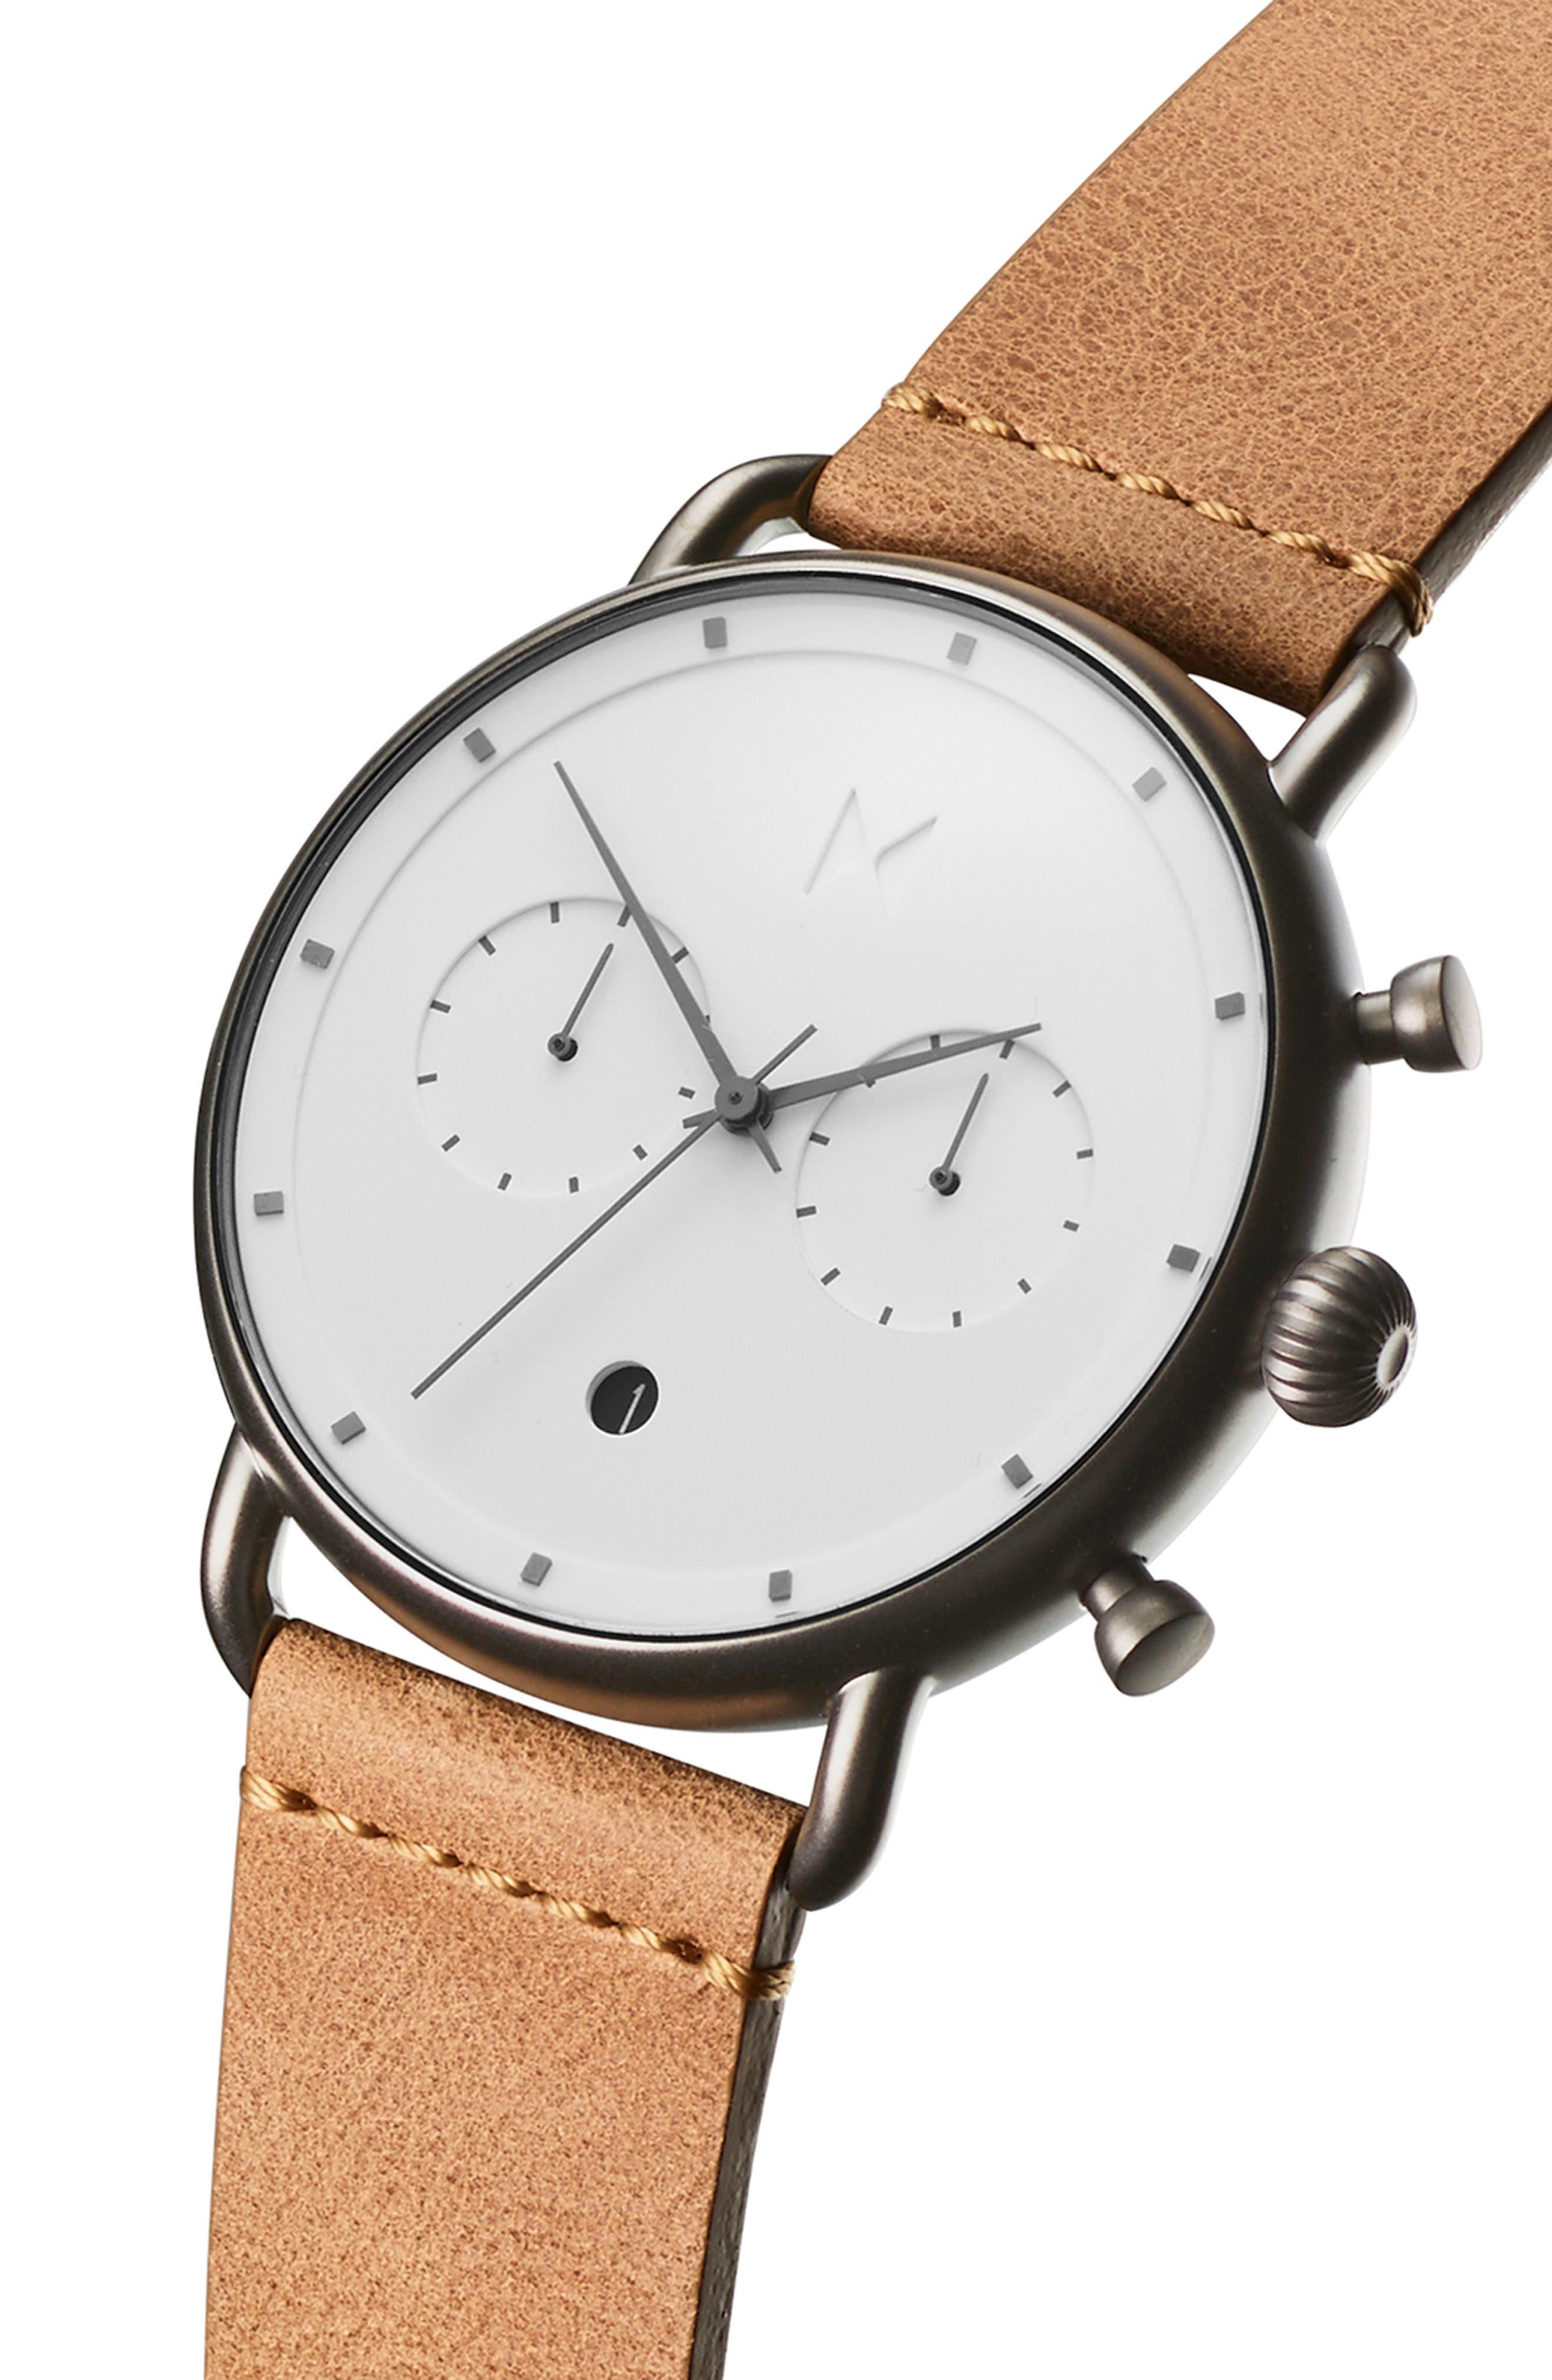 Blacktop Chronograph Leather Strap Watch,                             Alternate thumbnail 3, color,                             WHITE/ CARAMEL